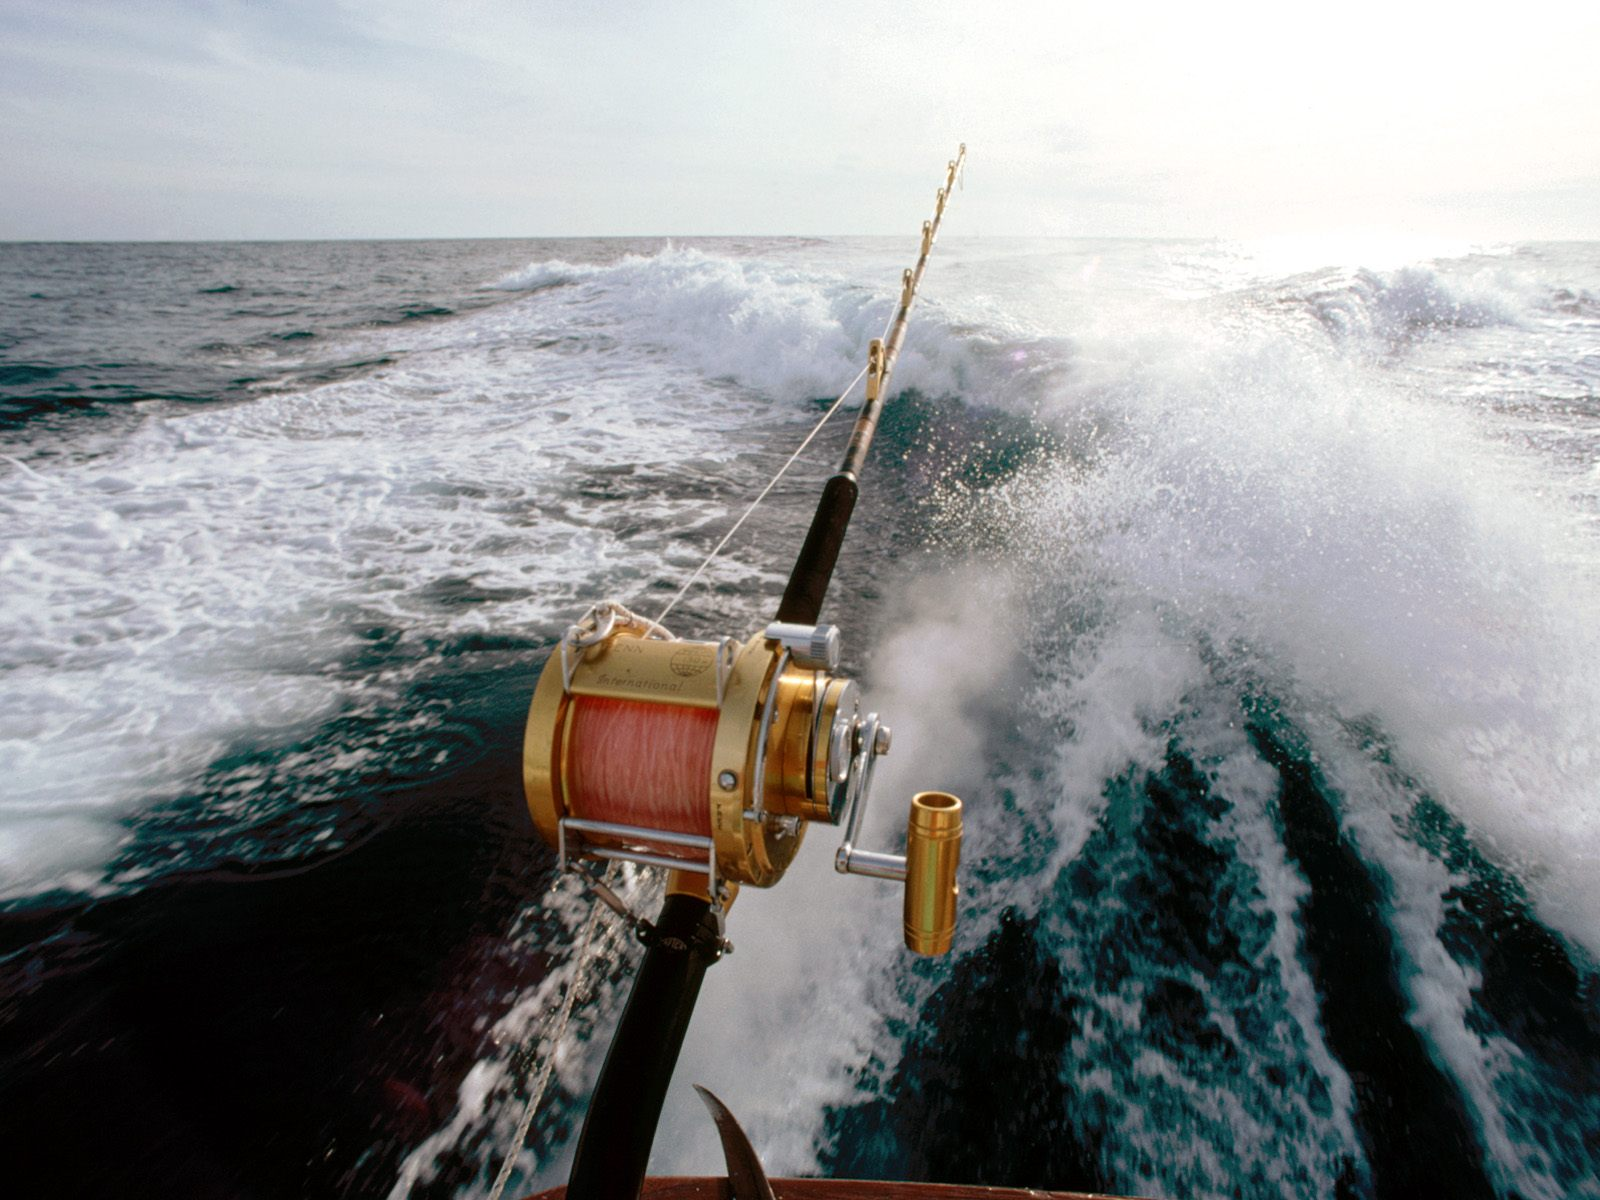 42+ Sport Fishing Boat Wallpaper on WallpaperSafari